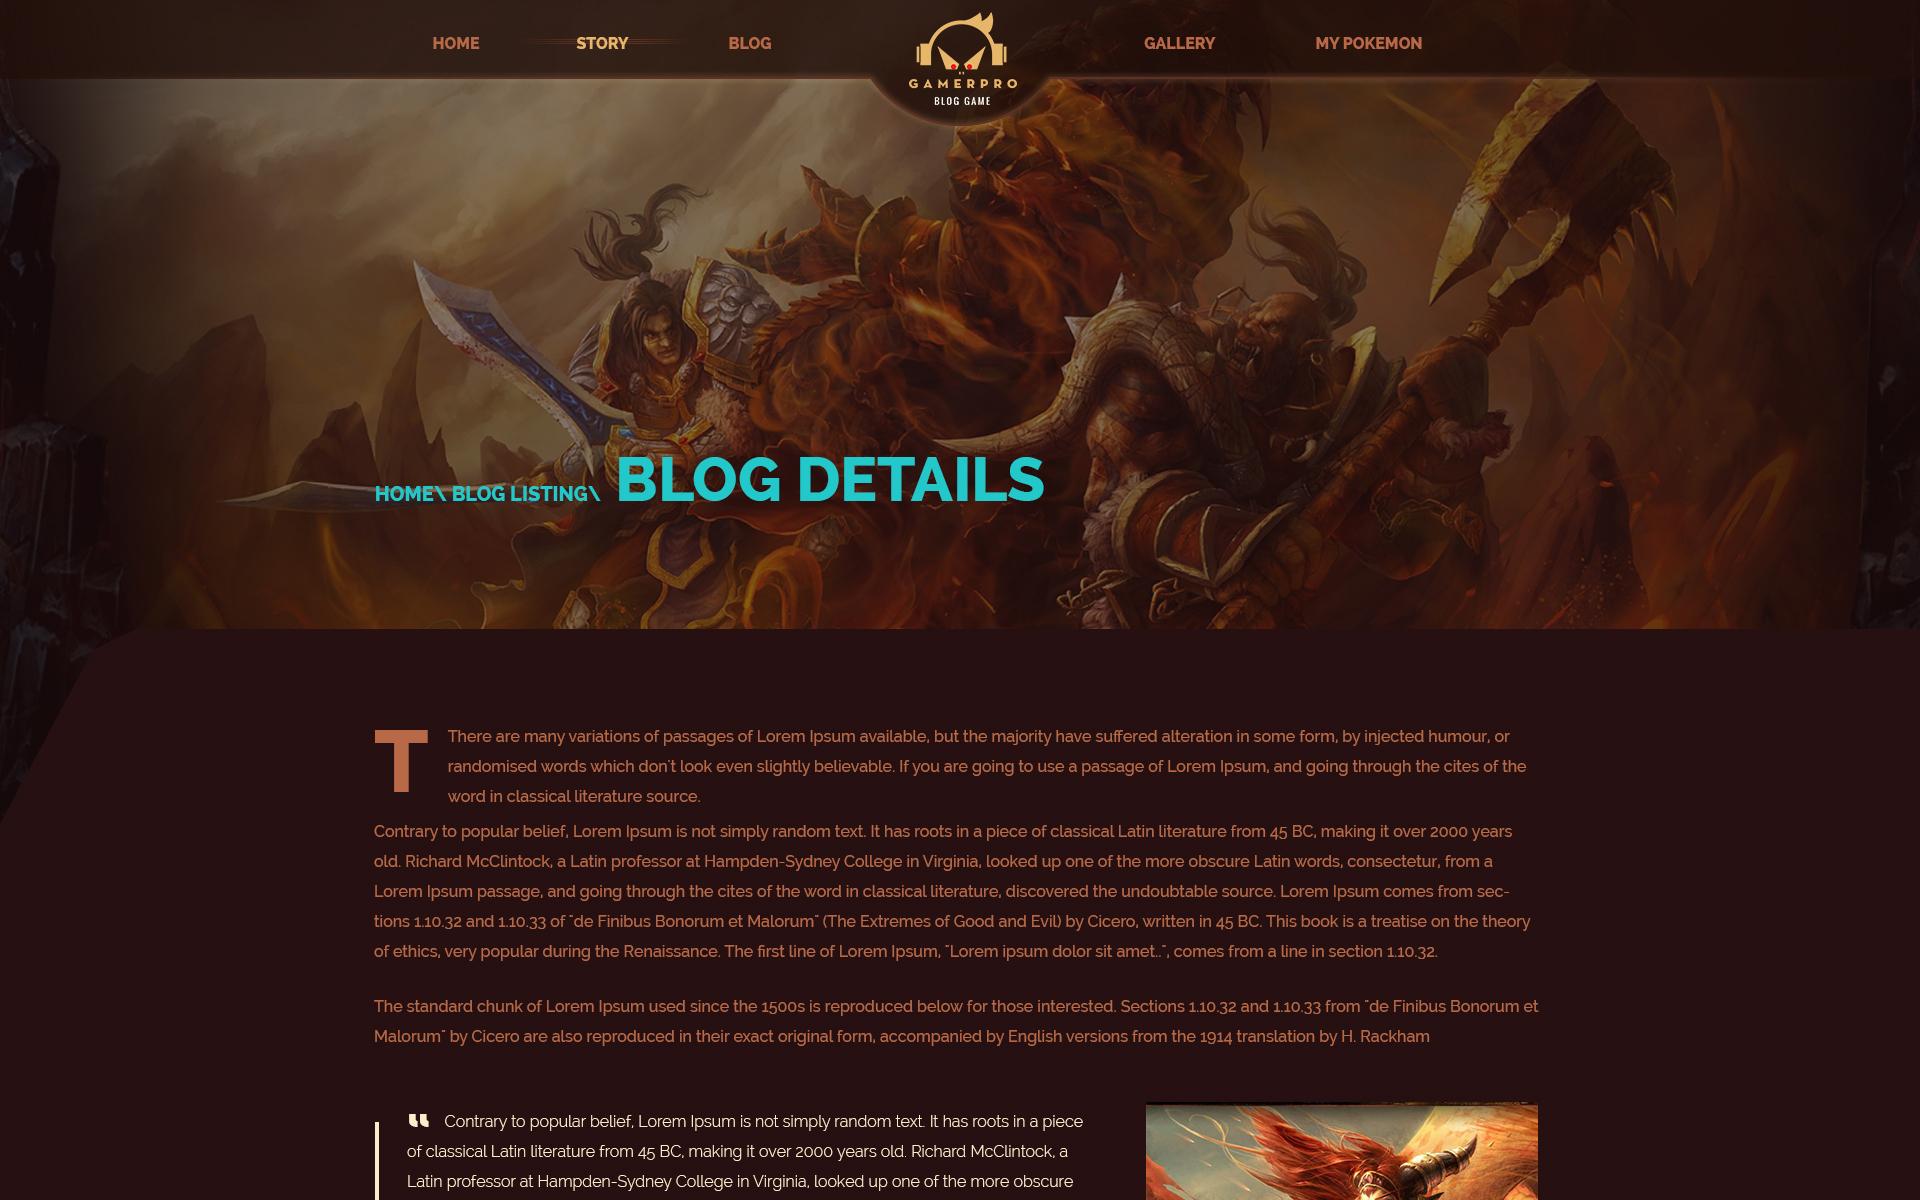 https://s3.tmimgcdn.com/templates/1031/scr/07_Gamerpro_blog_detail_01.jpg